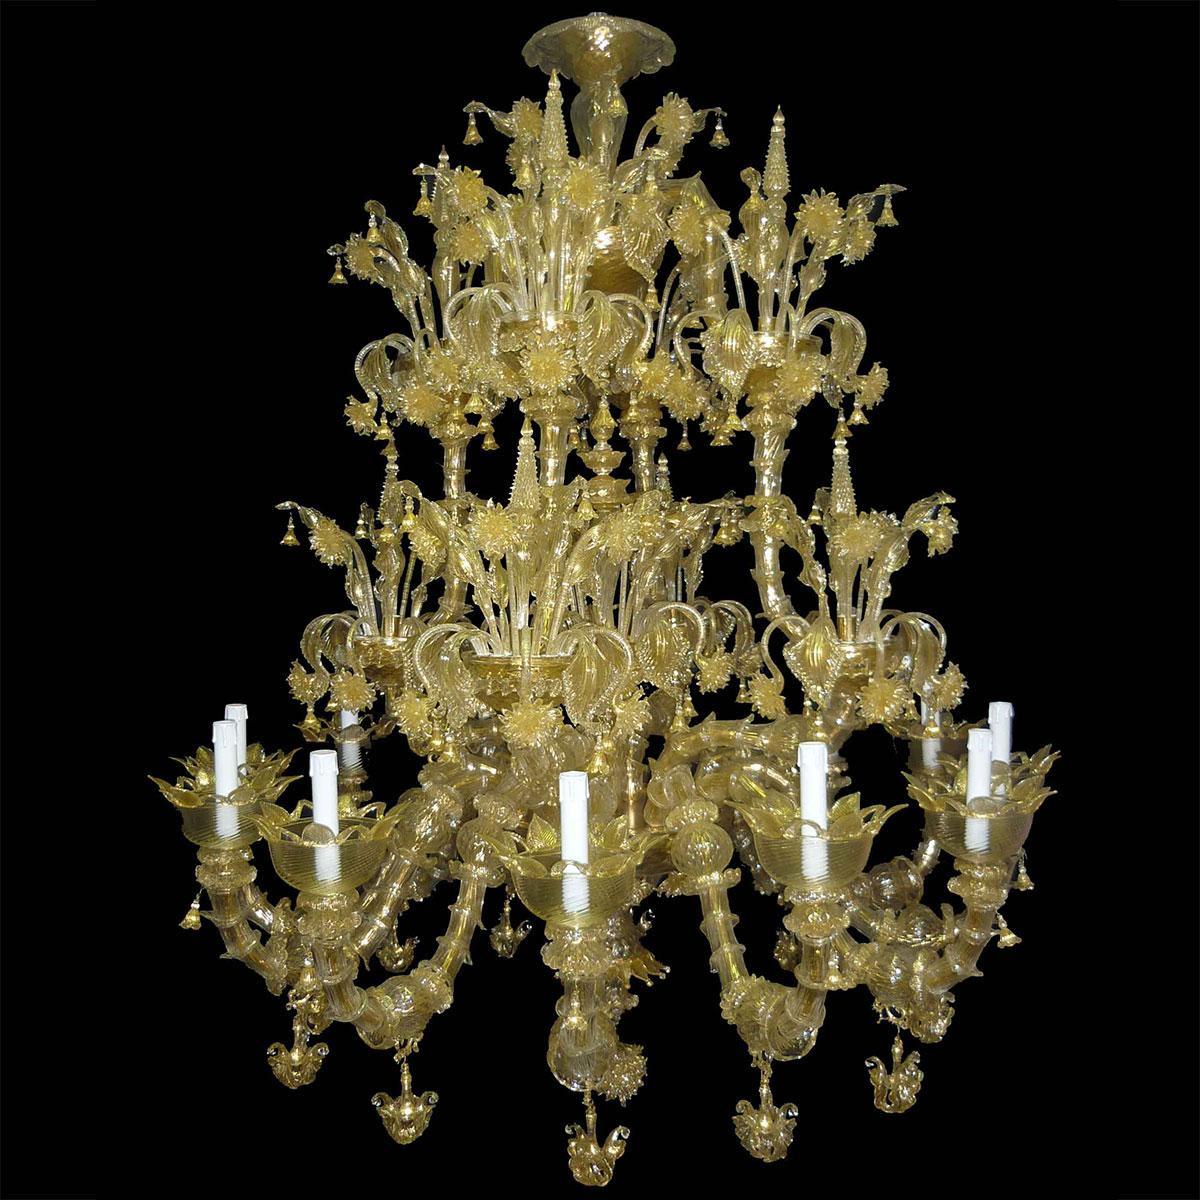 """Adelchi"" lustre en cristal de Murano - 12 lumières - or"